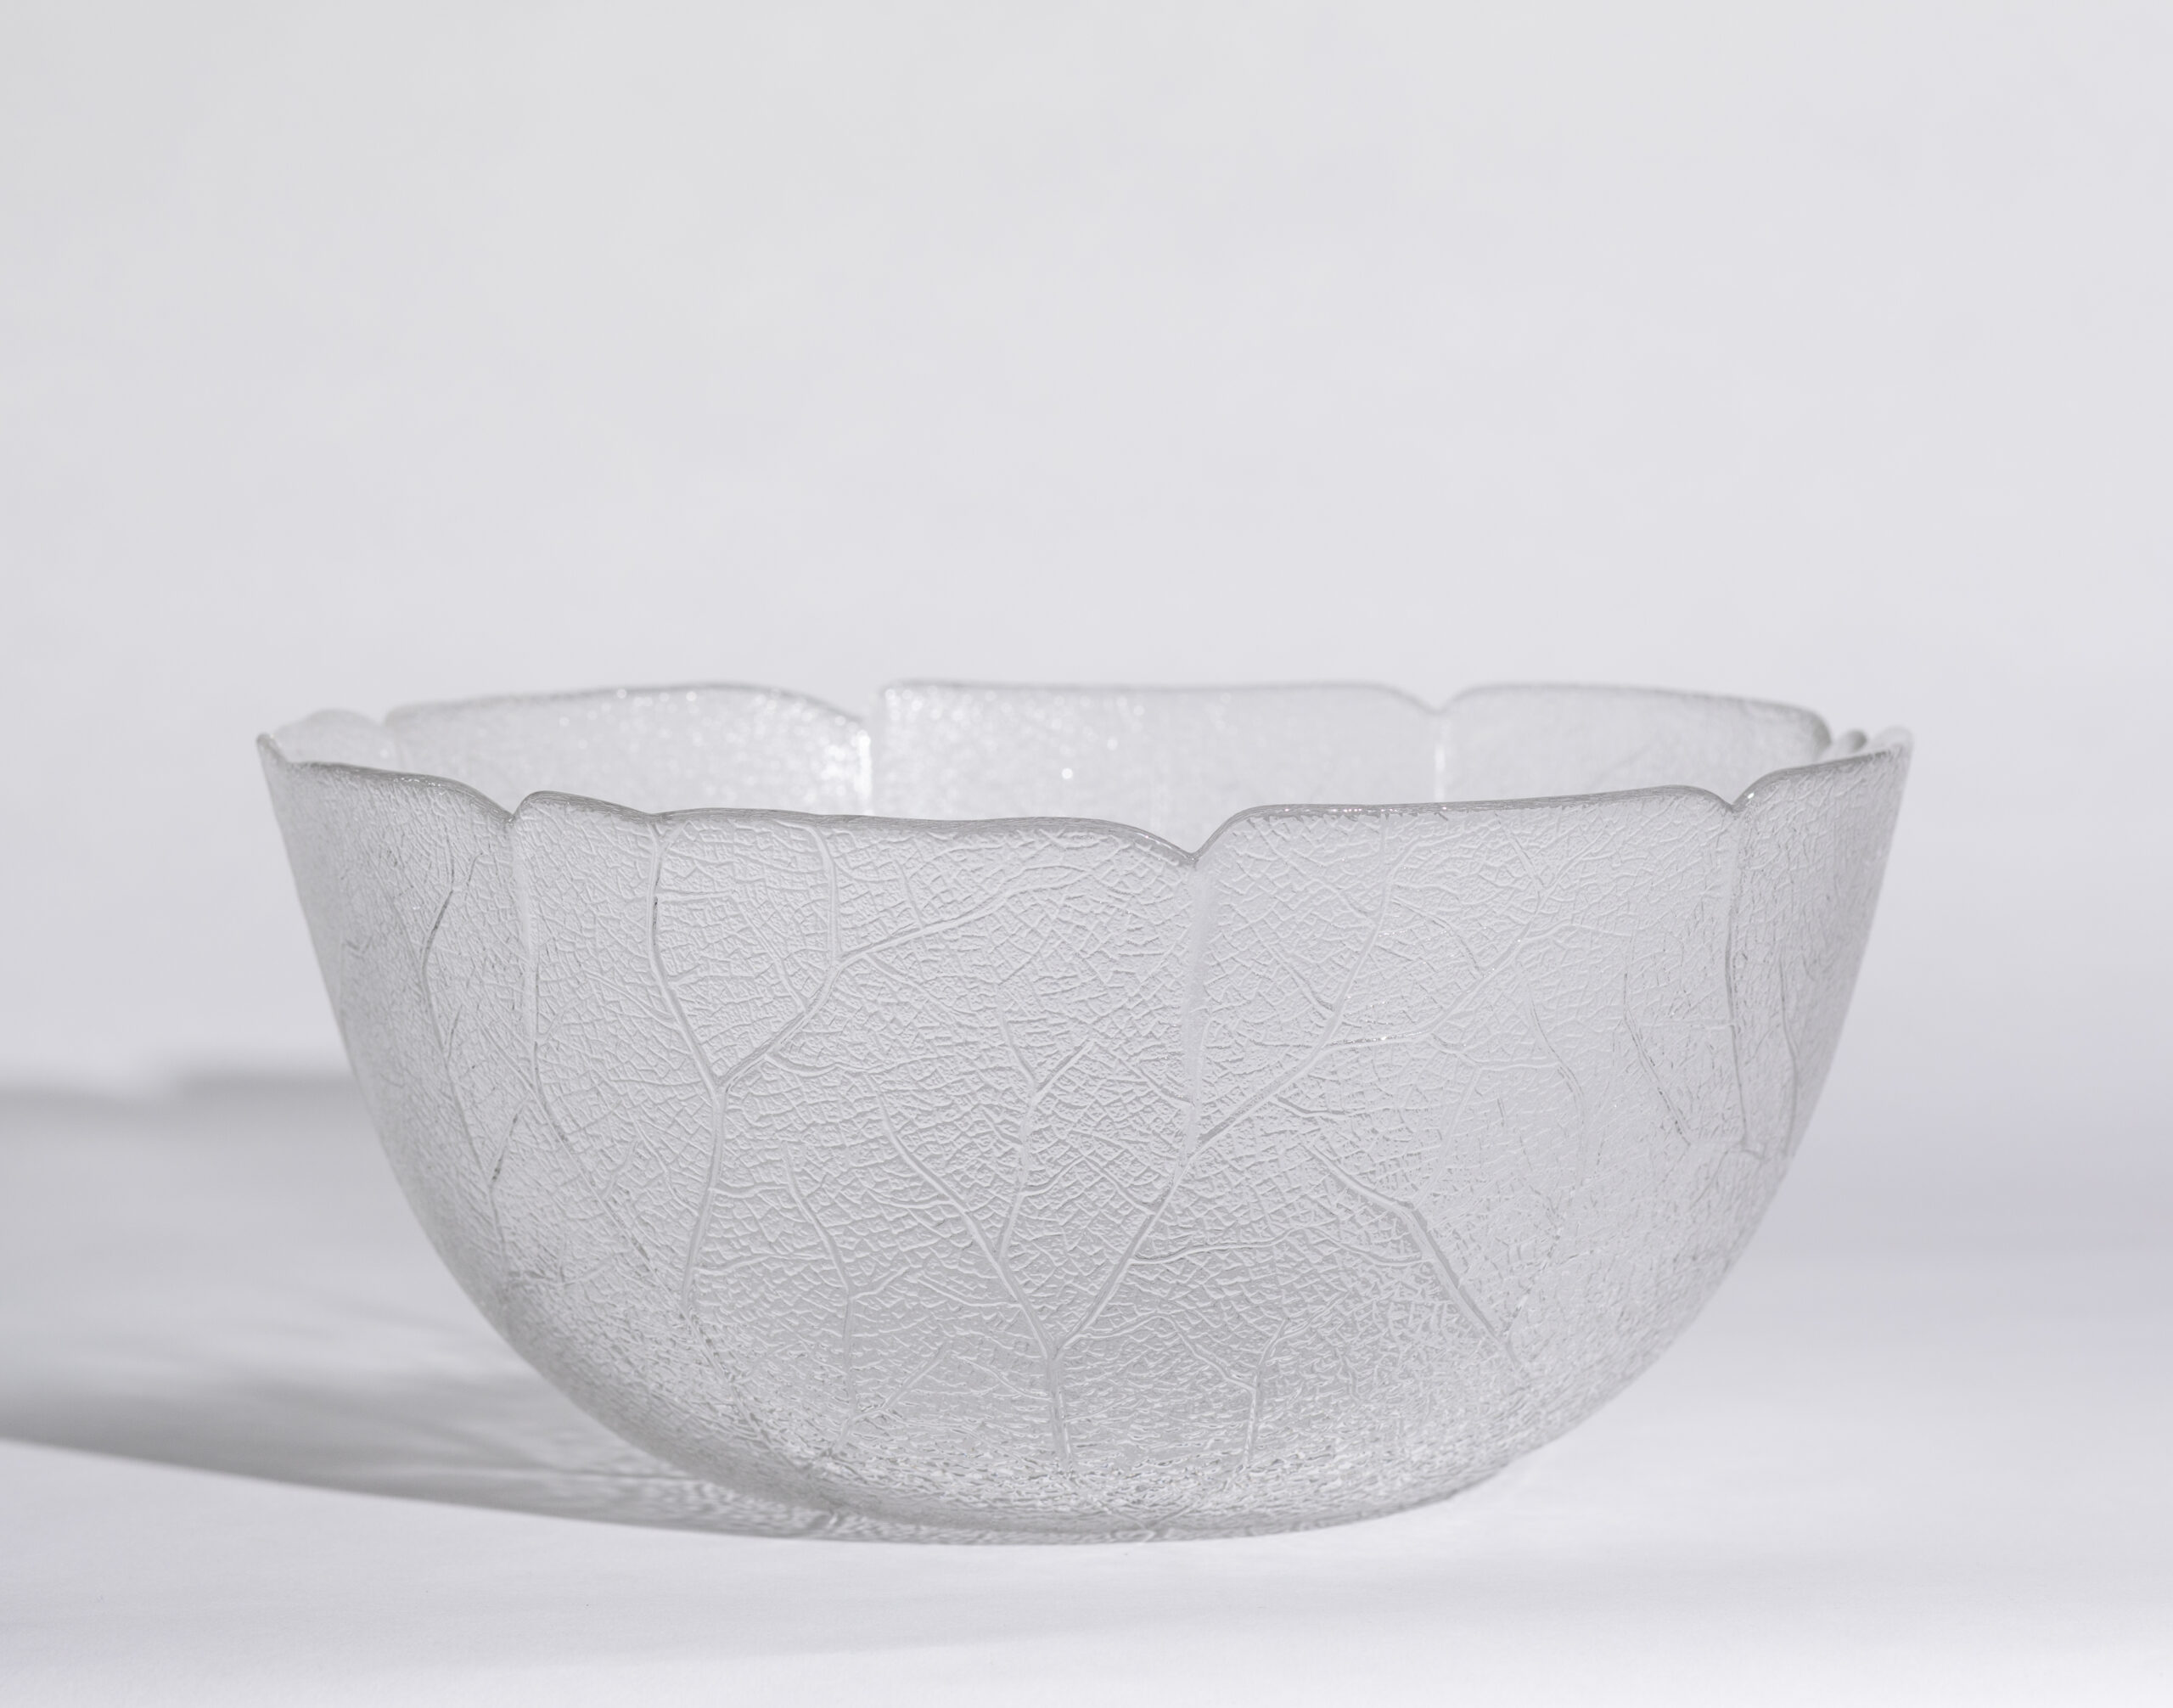 Salad bowl (12'', round, glass)